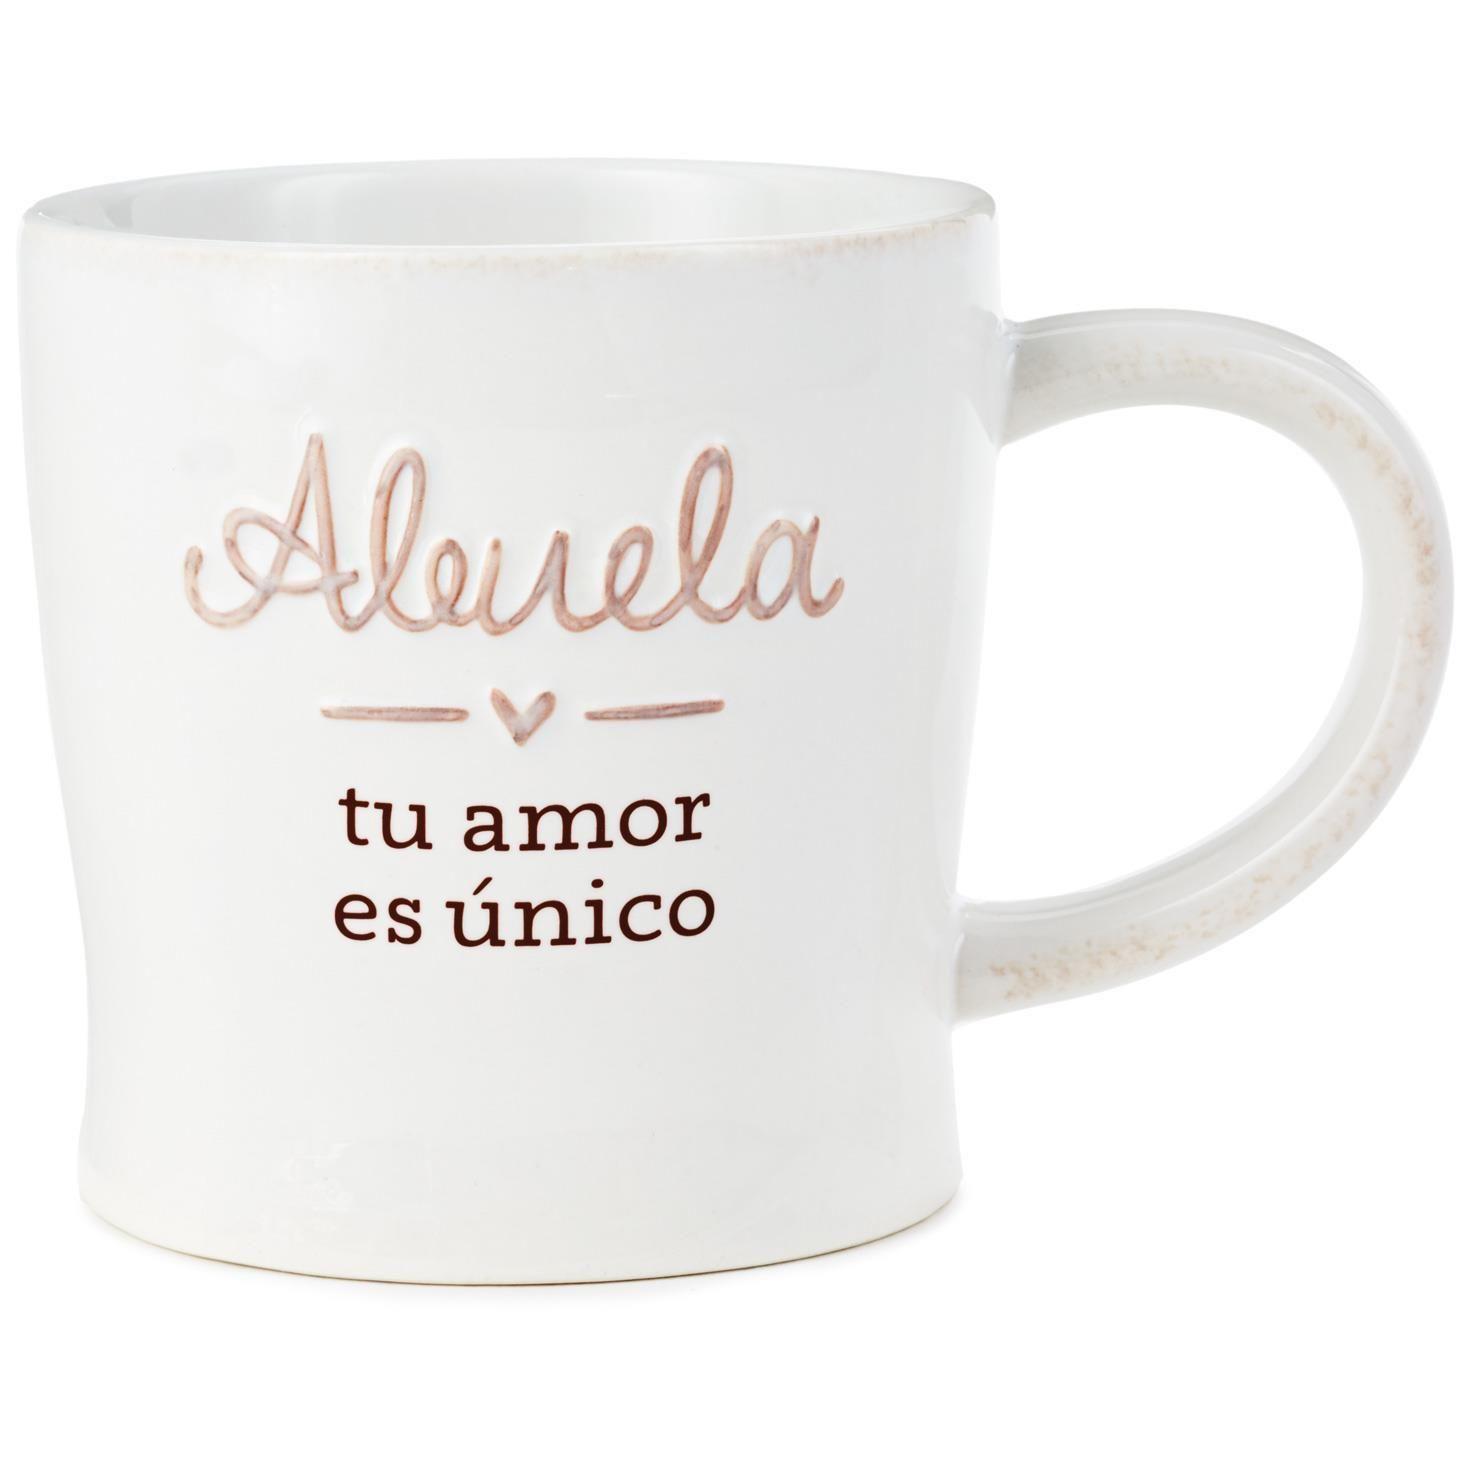 Grandma your love is unique spanishlanguage mug 12 oz